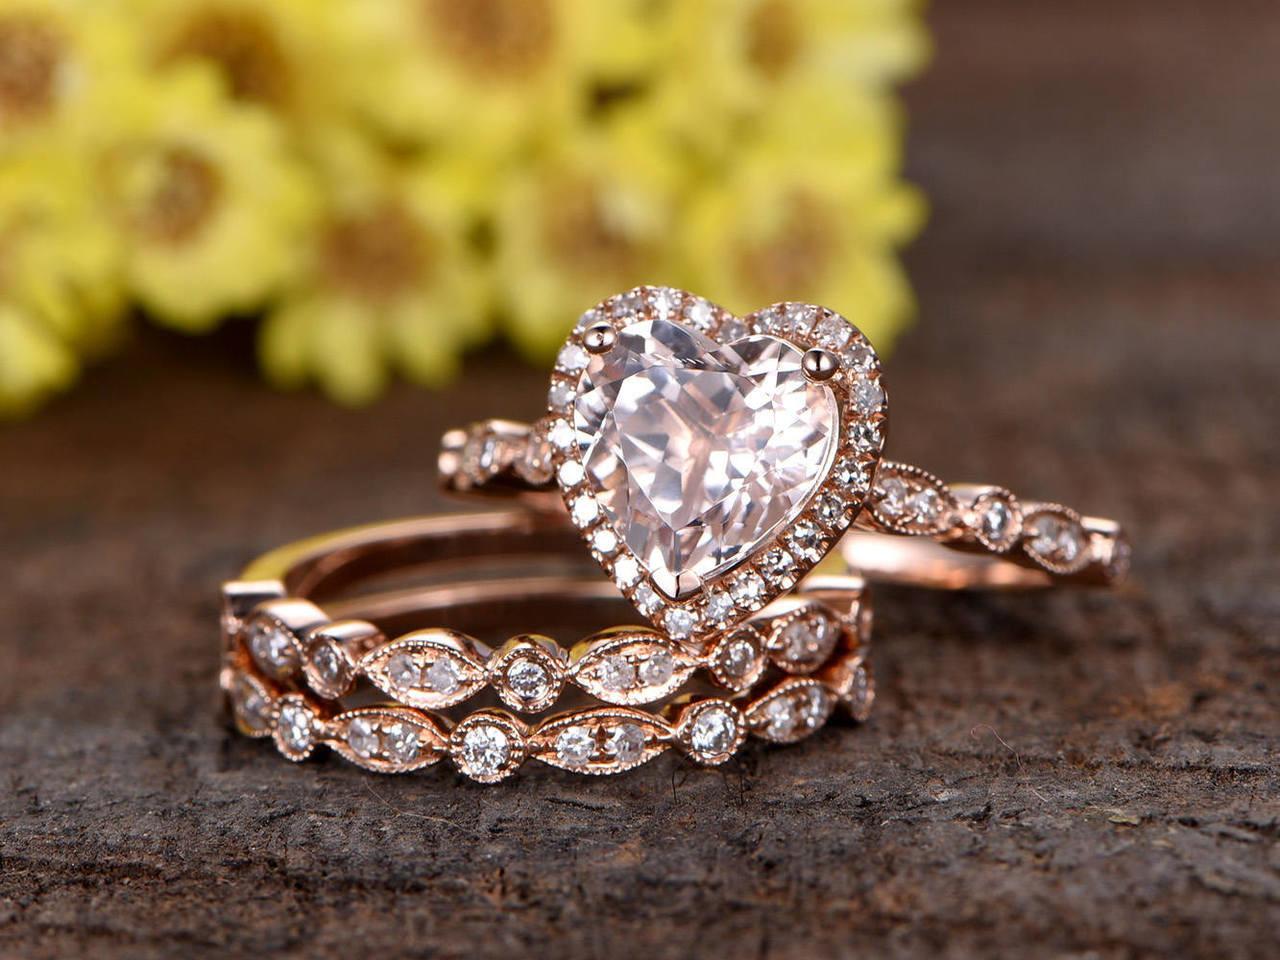 7mm heart shaped pink Morganite engagement ring sethalf eternity